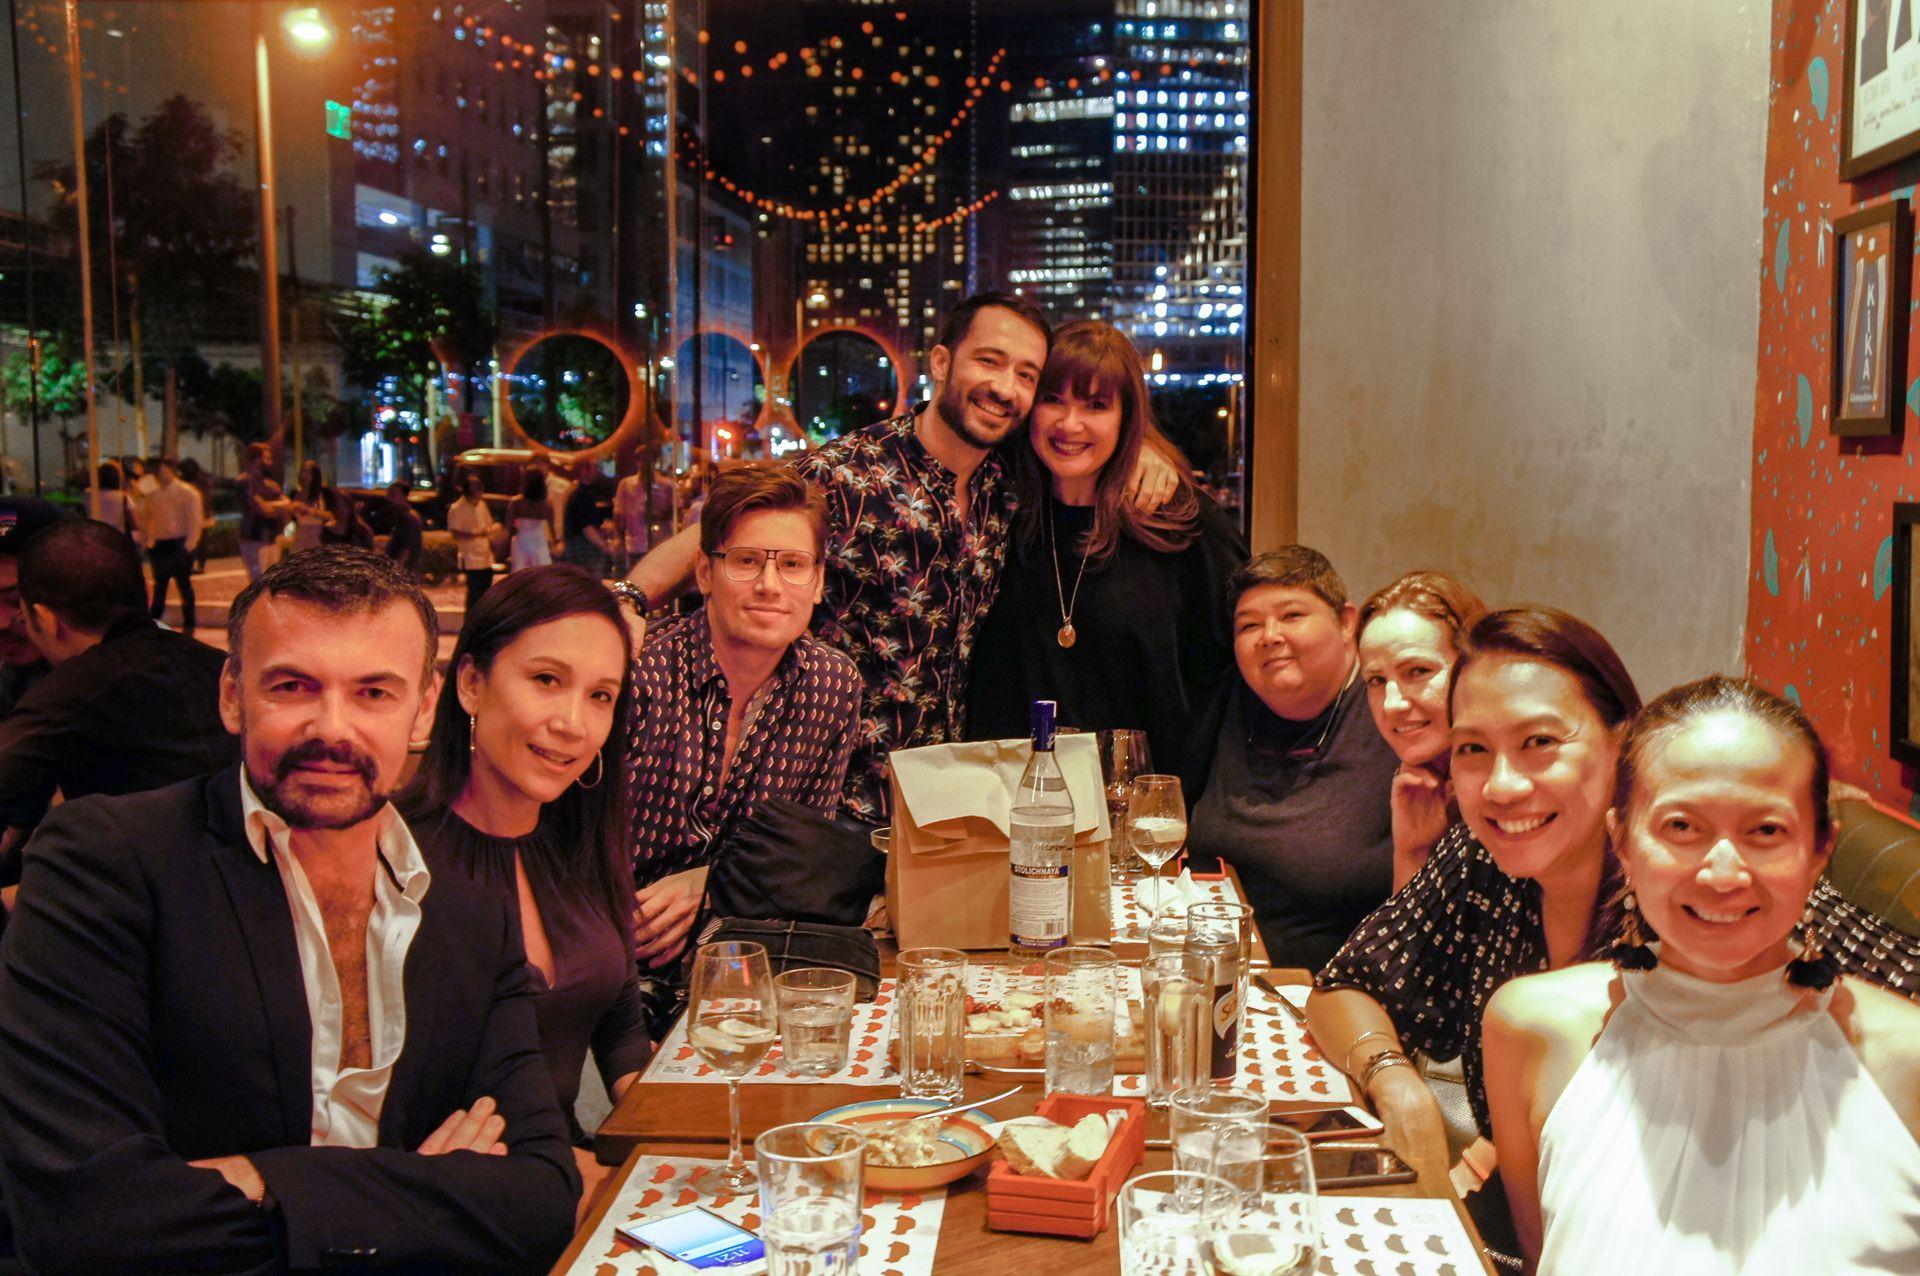 Xavier Bitesh, Christine San Diego, Kevin Kramer, Dani Aliaga, Cheska Winebrenner, Djila Winebrenner, Susi Occhionero, Joy Natividad, Louise Lee